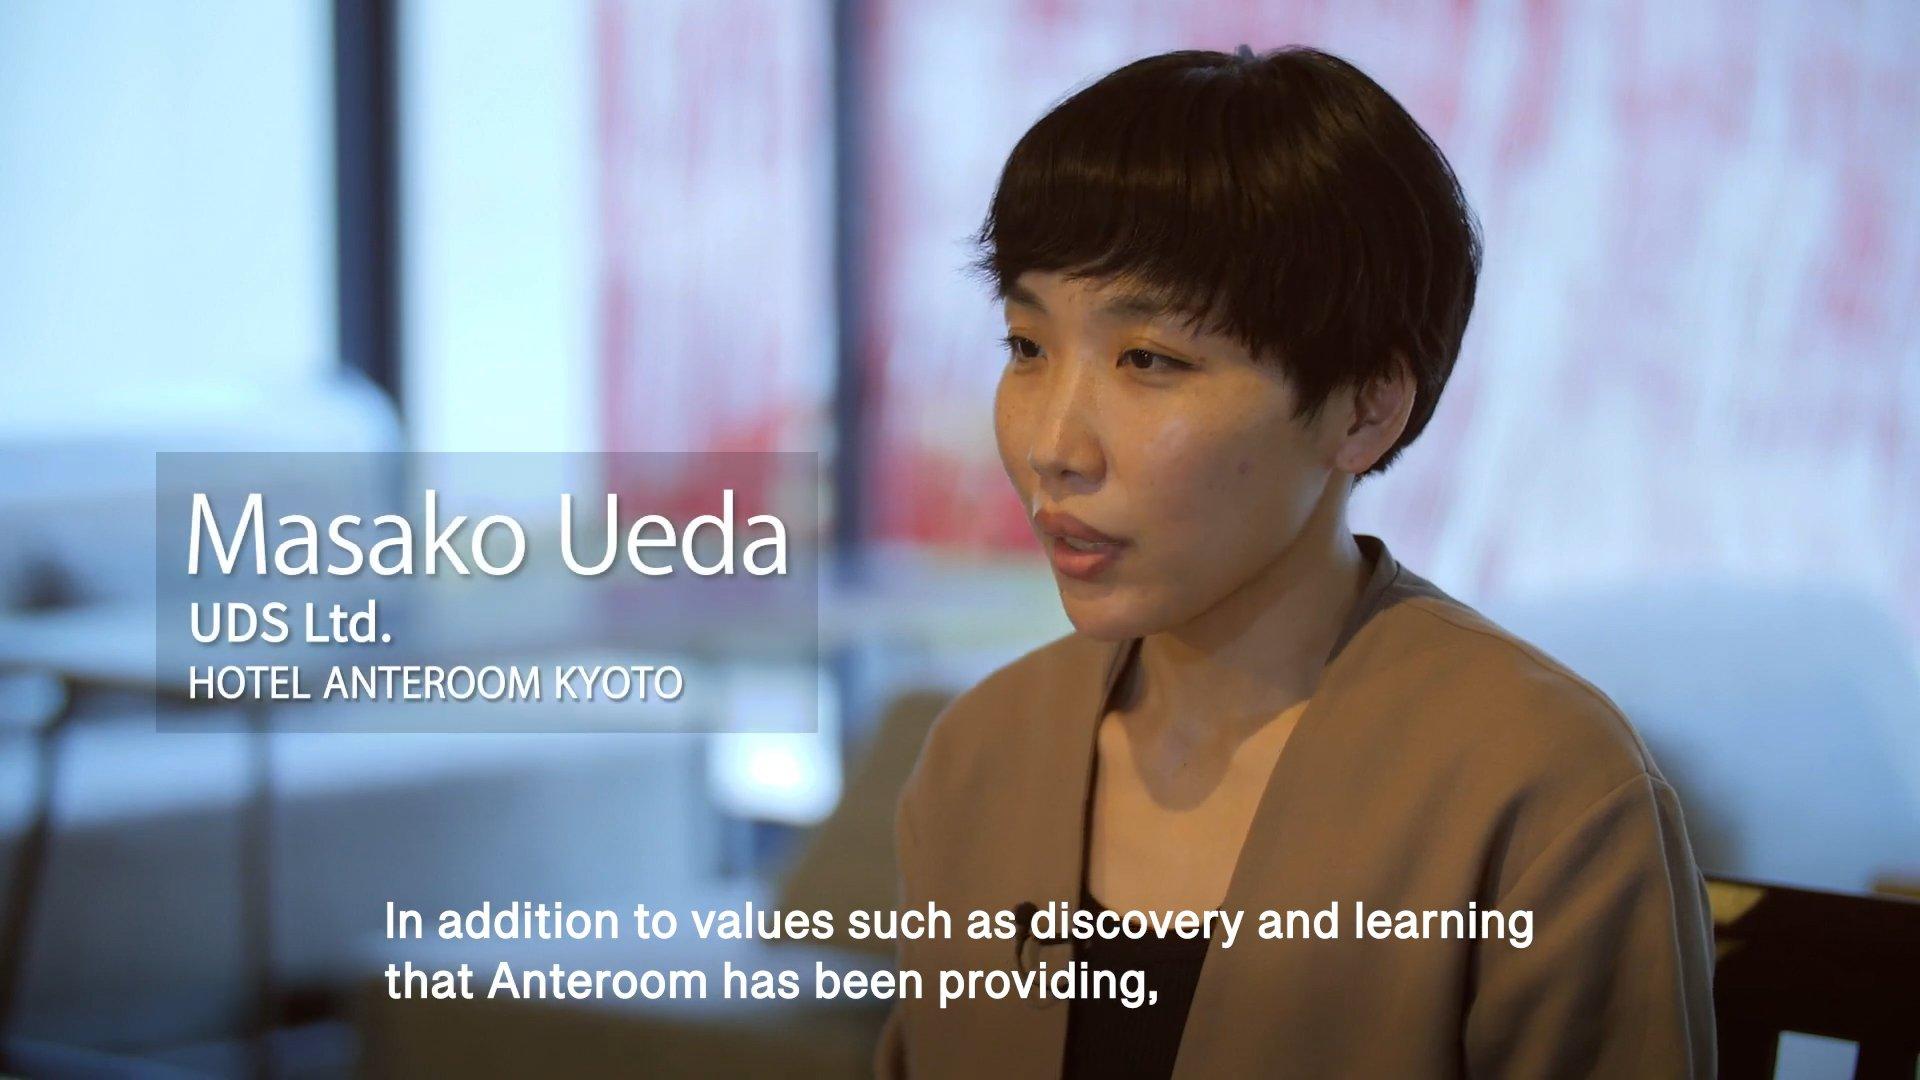 A screenshot from the video '(MU)ROOM x HOTEL ANTEROOM KYOTO'